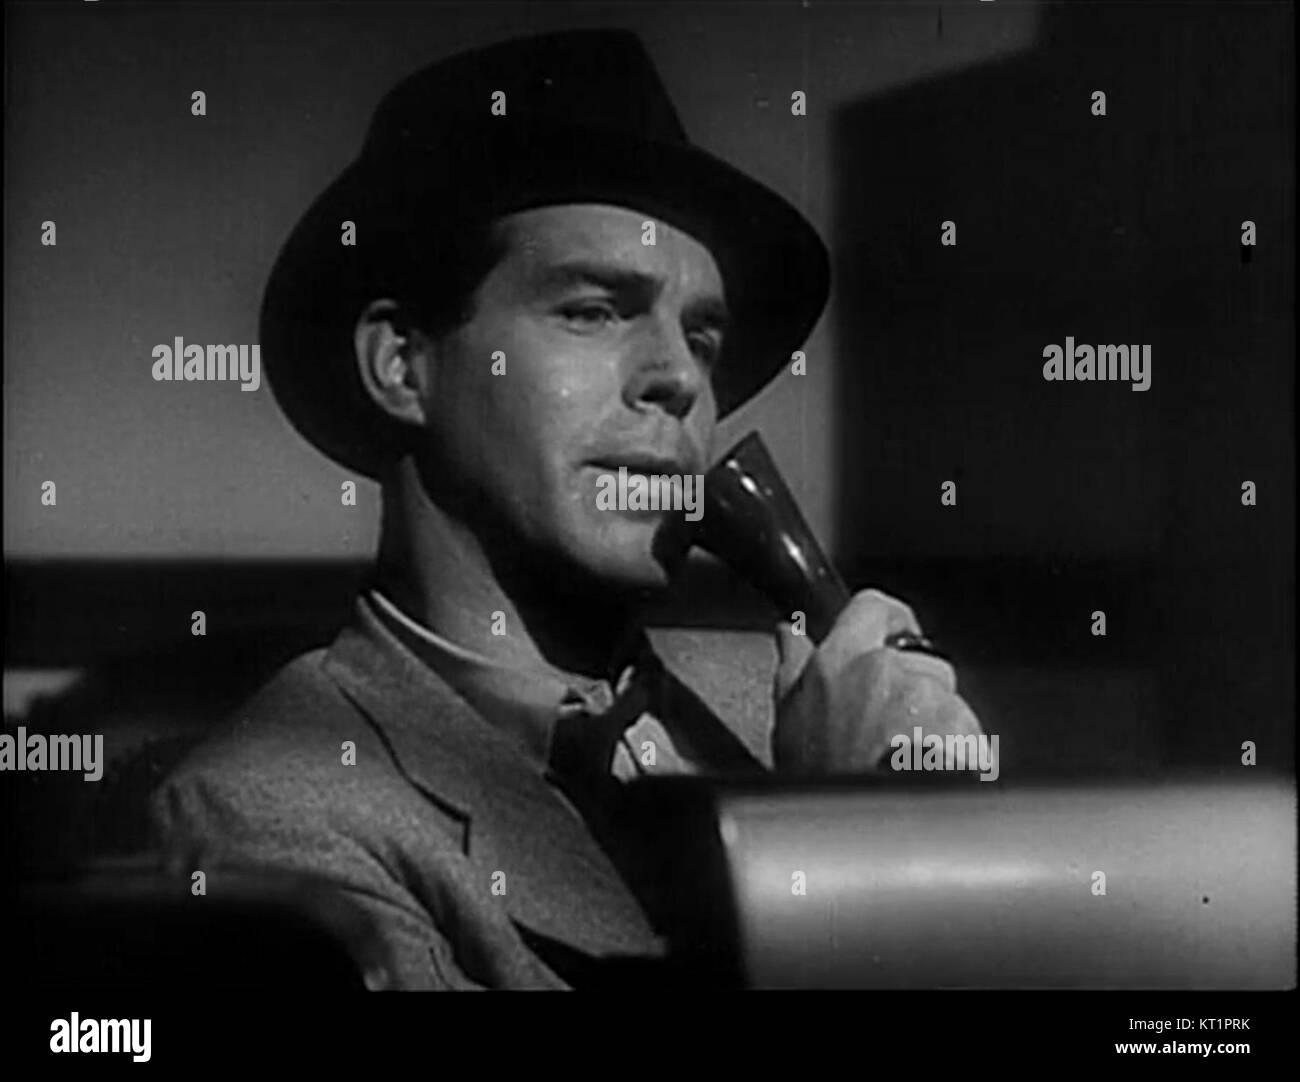 Double indemnity screenshot 1 - Stock Image